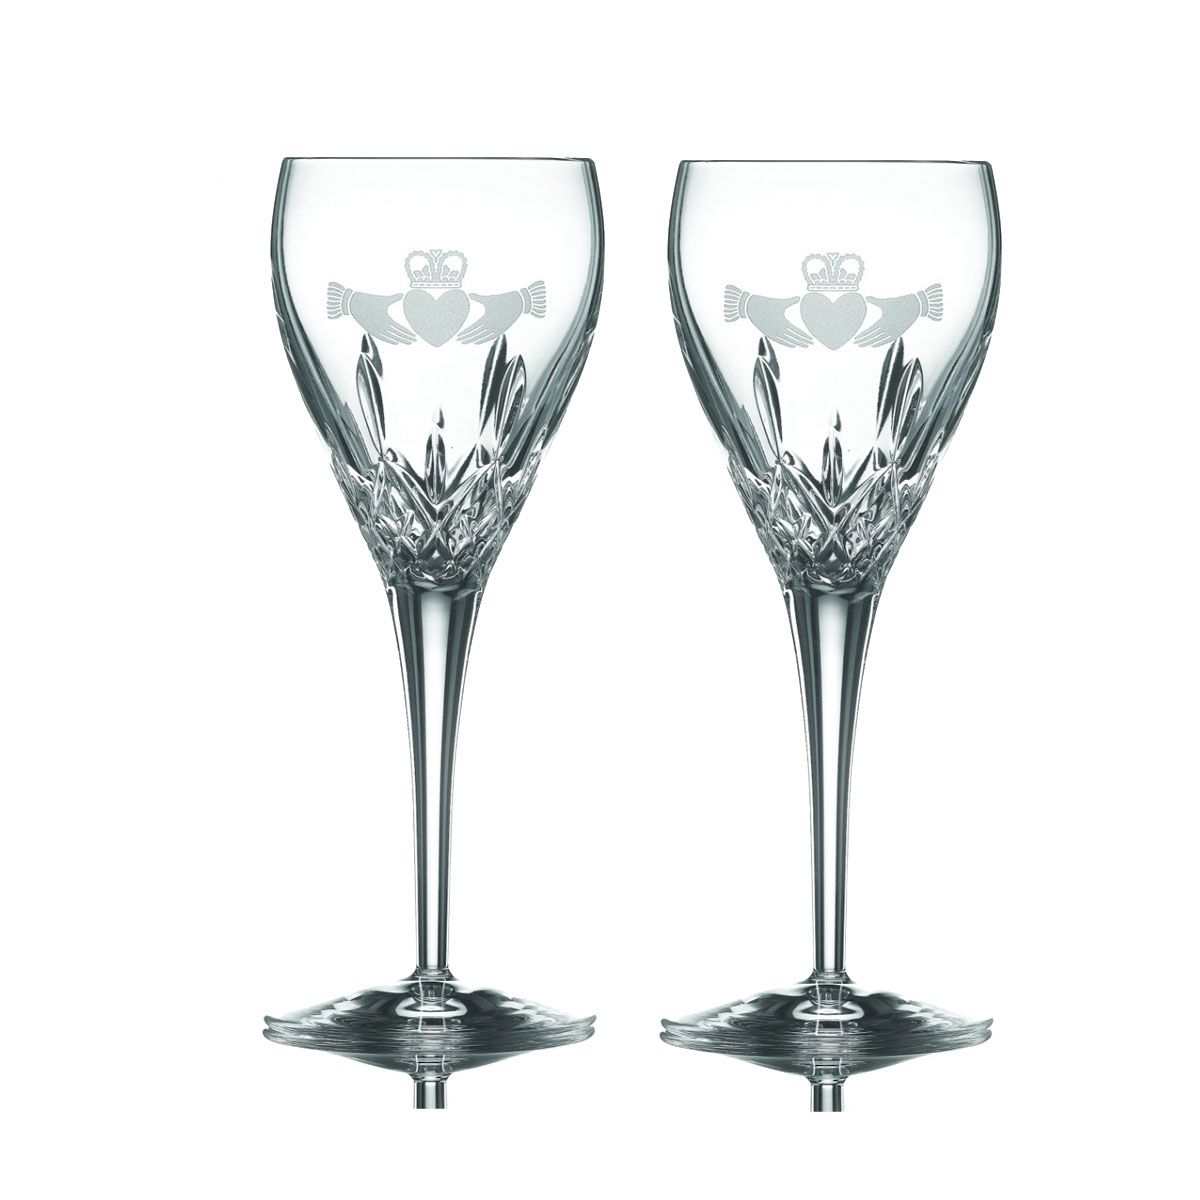 Galway Crystal Claddagh Friendship Wine, Pair